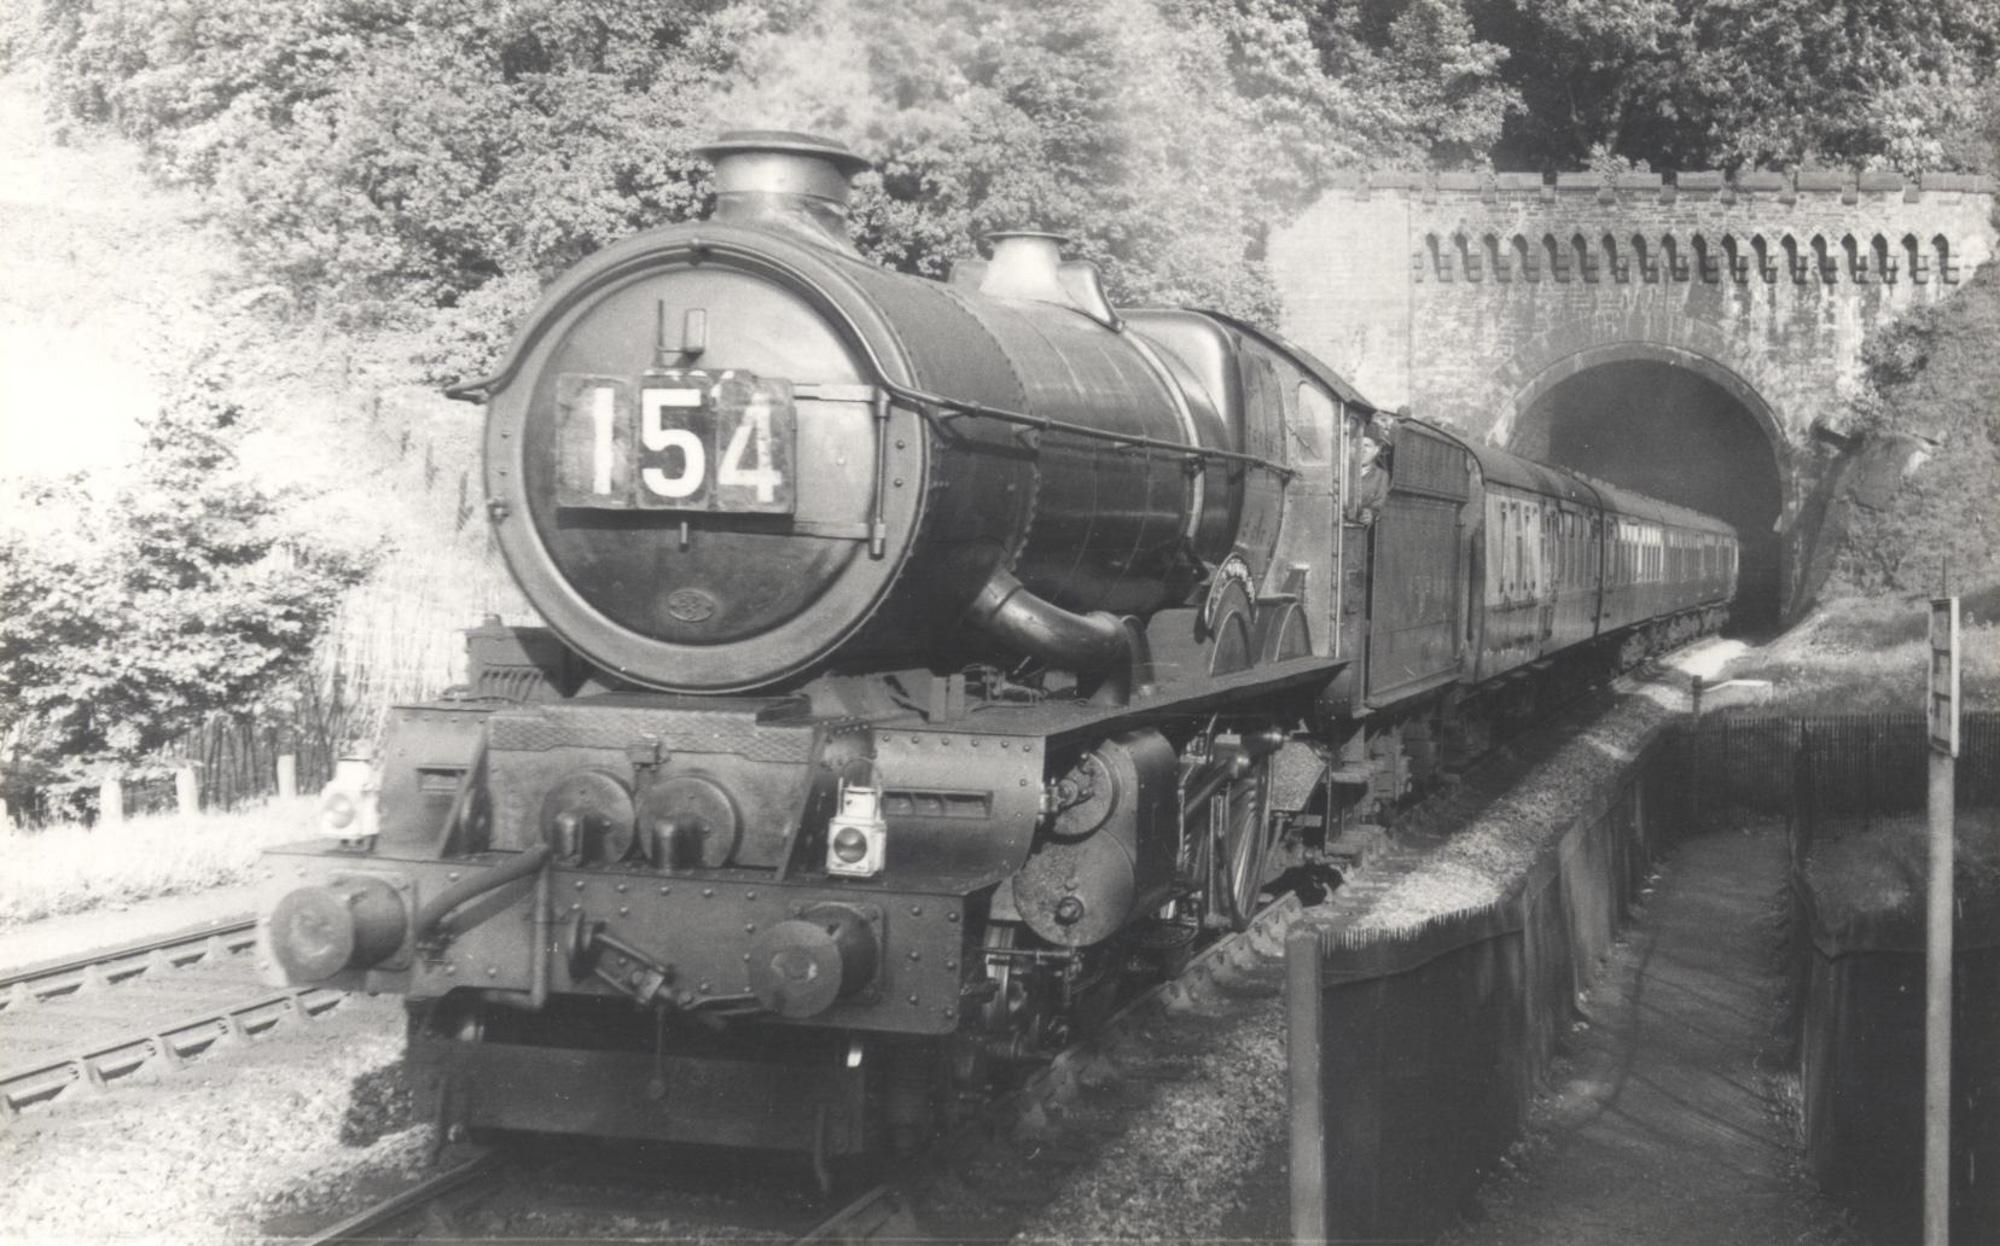 No. 6024 at St Annes Park, Bristol, May 1958. © Mr Sharp